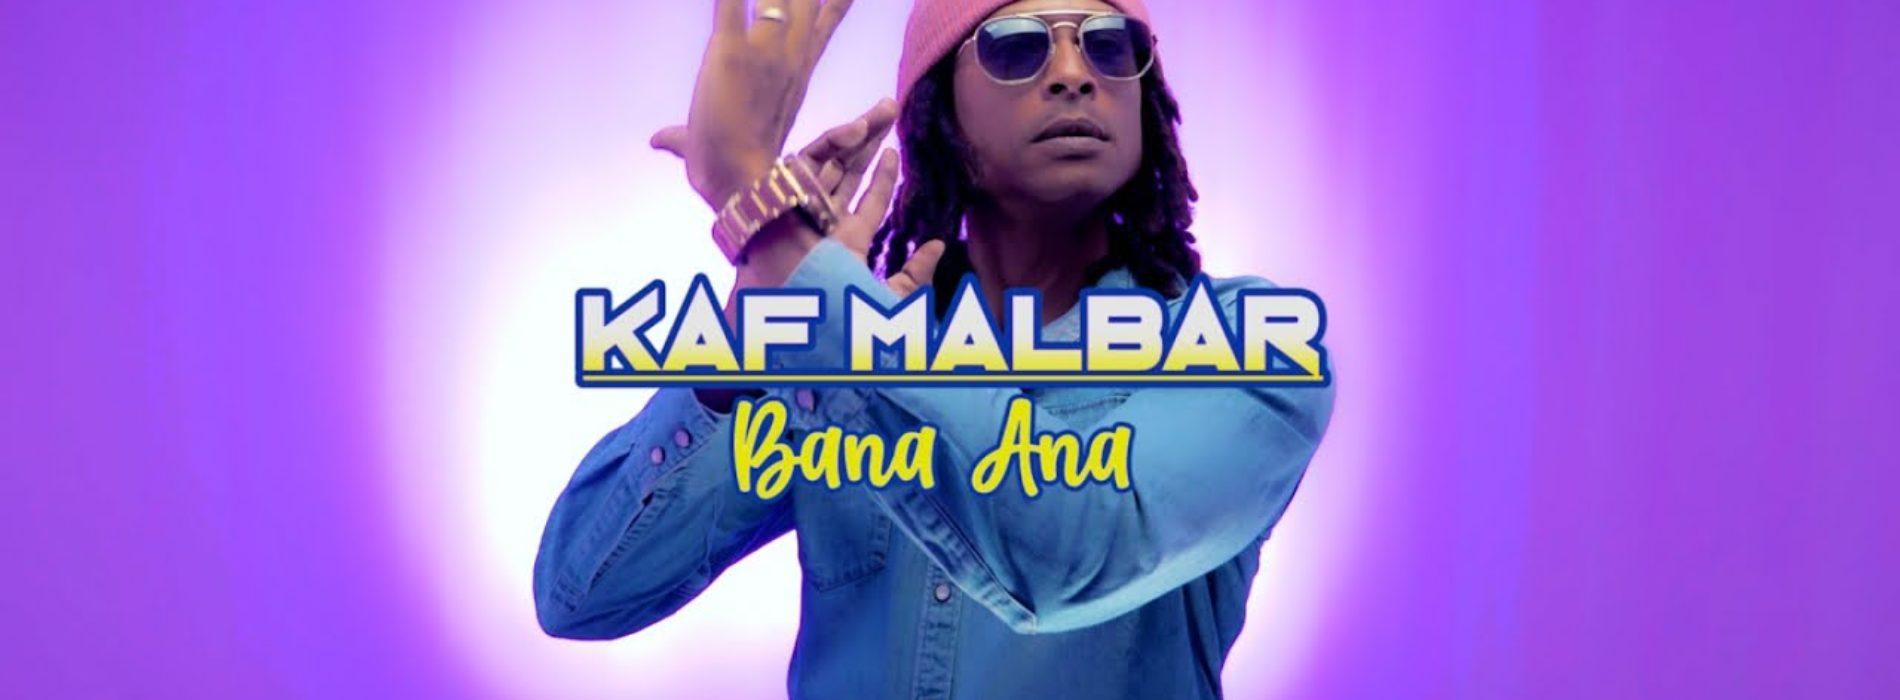 Kaf Malbar – Bana Ana – #AnFouPaMalStaya – (Clip officiel) – Octobre 2020